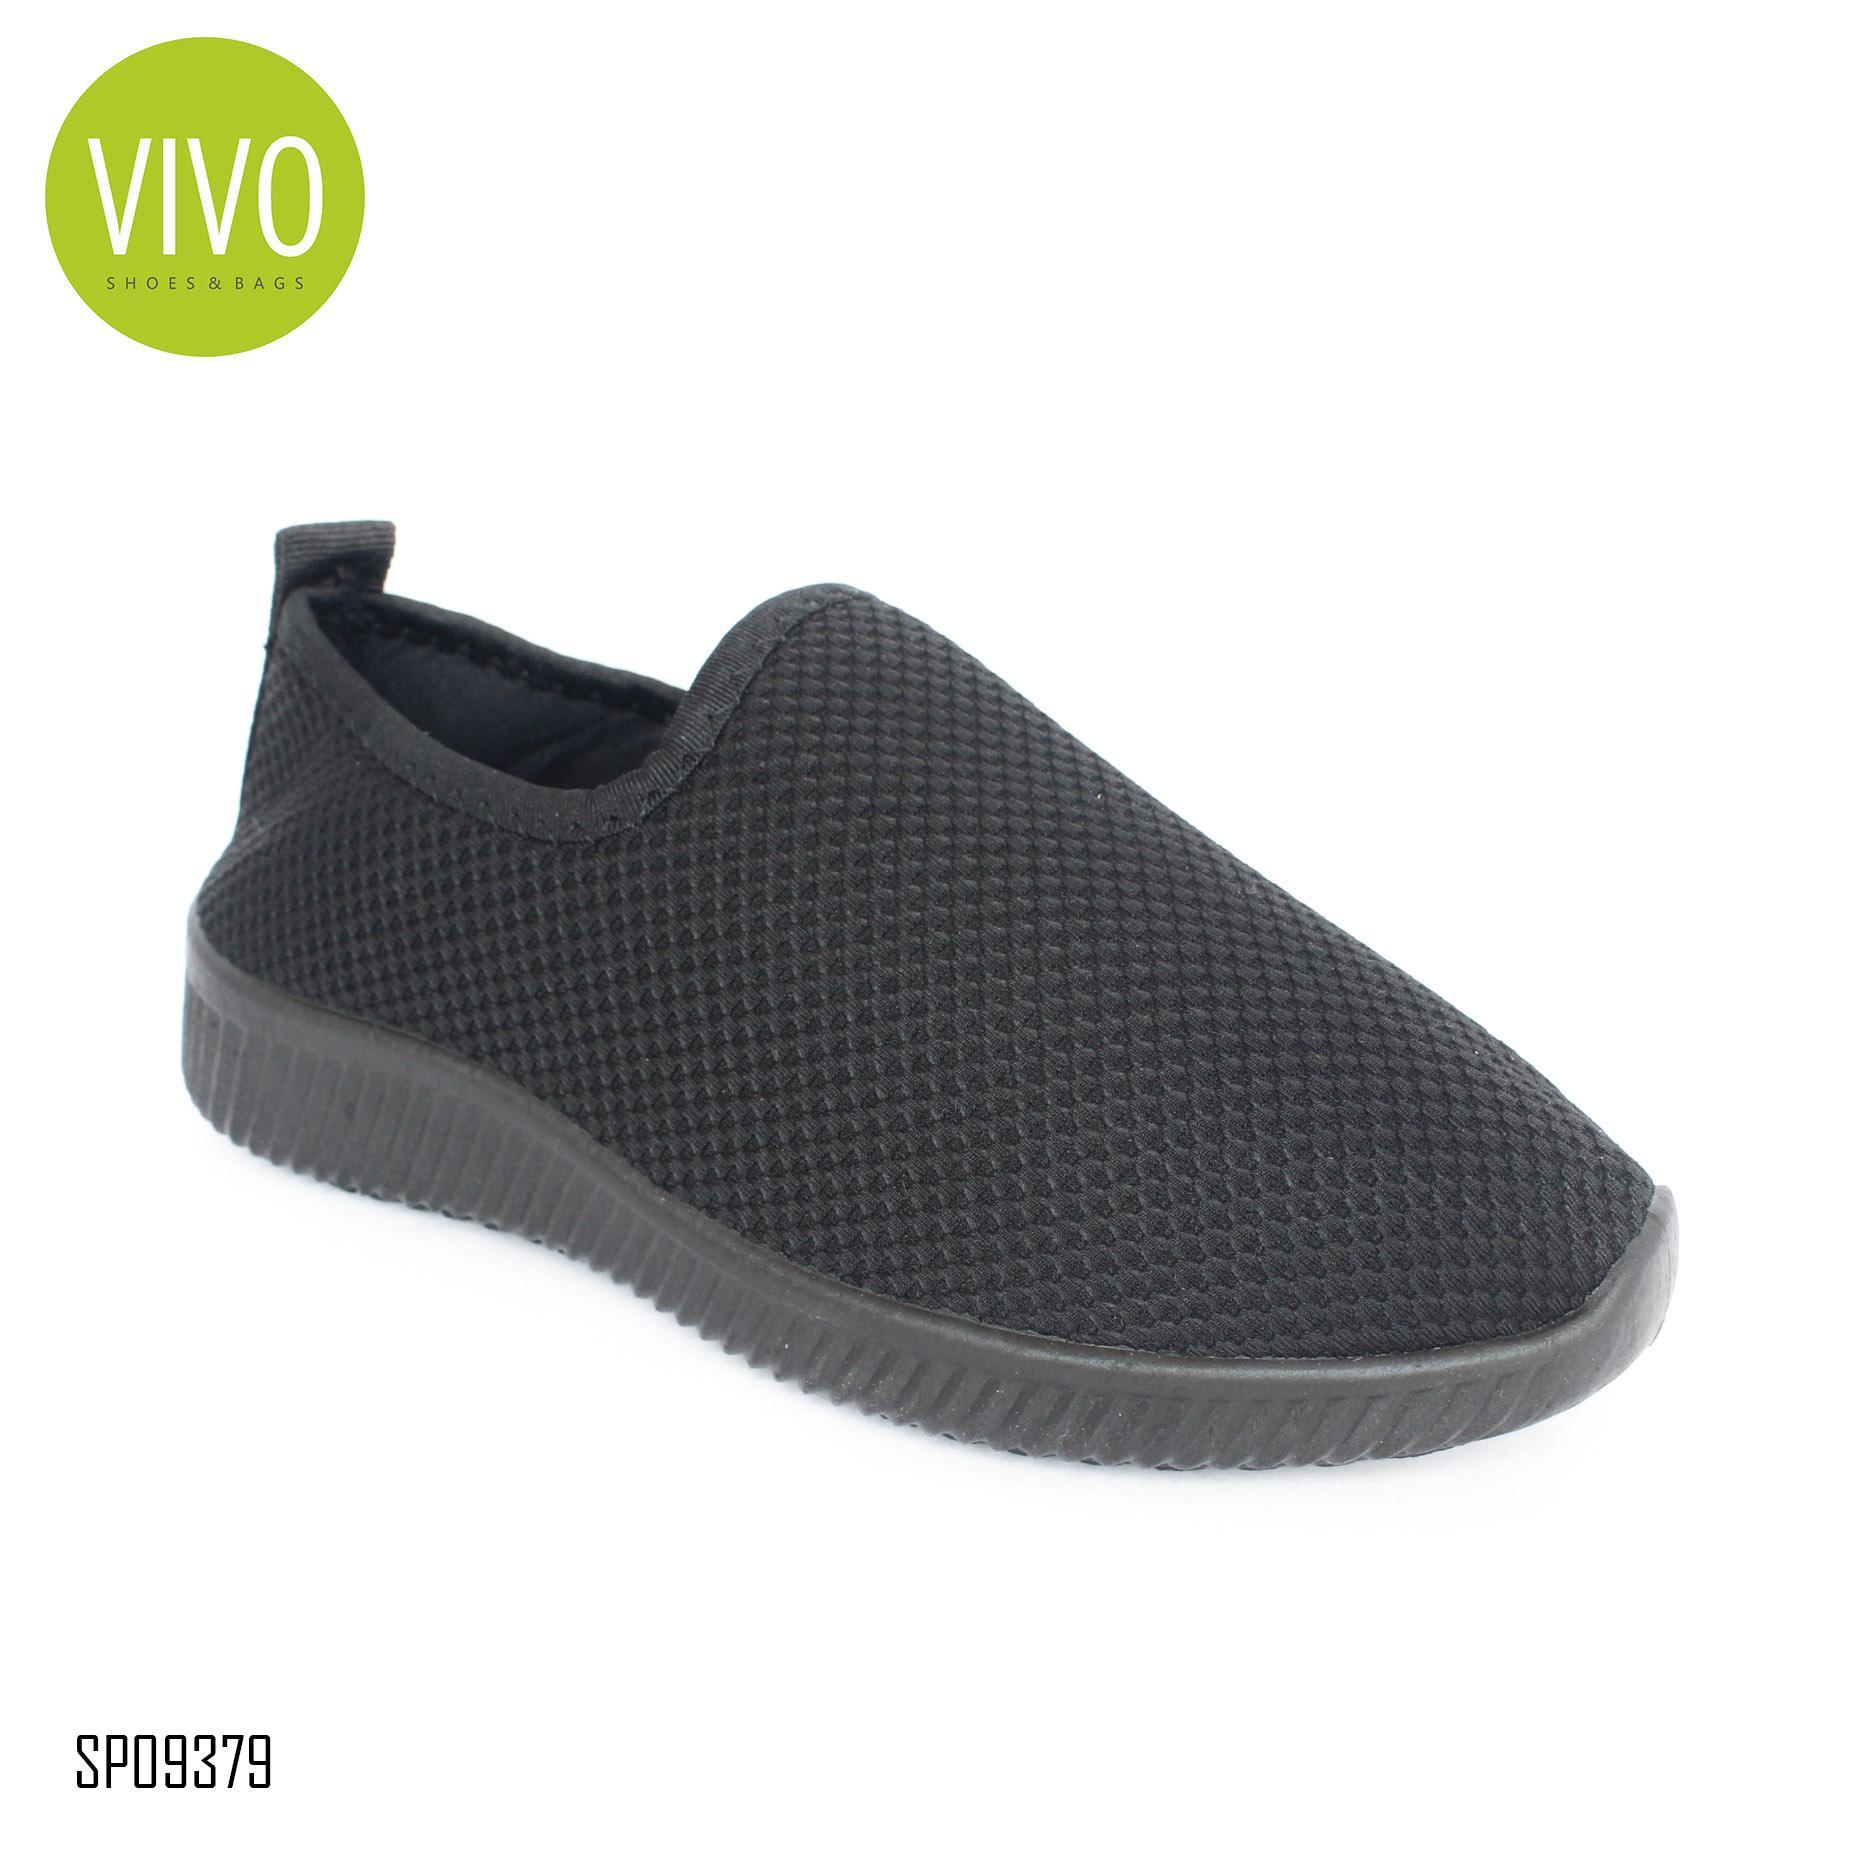 Vivo Fashion Sepatu Wanita/ Flat Shoes Wanita/ Sepatu Slip On Wanita/ Sepatu Casual Wanita/ Sepatu Sport Wanita SP09379 - Black Size 36/40